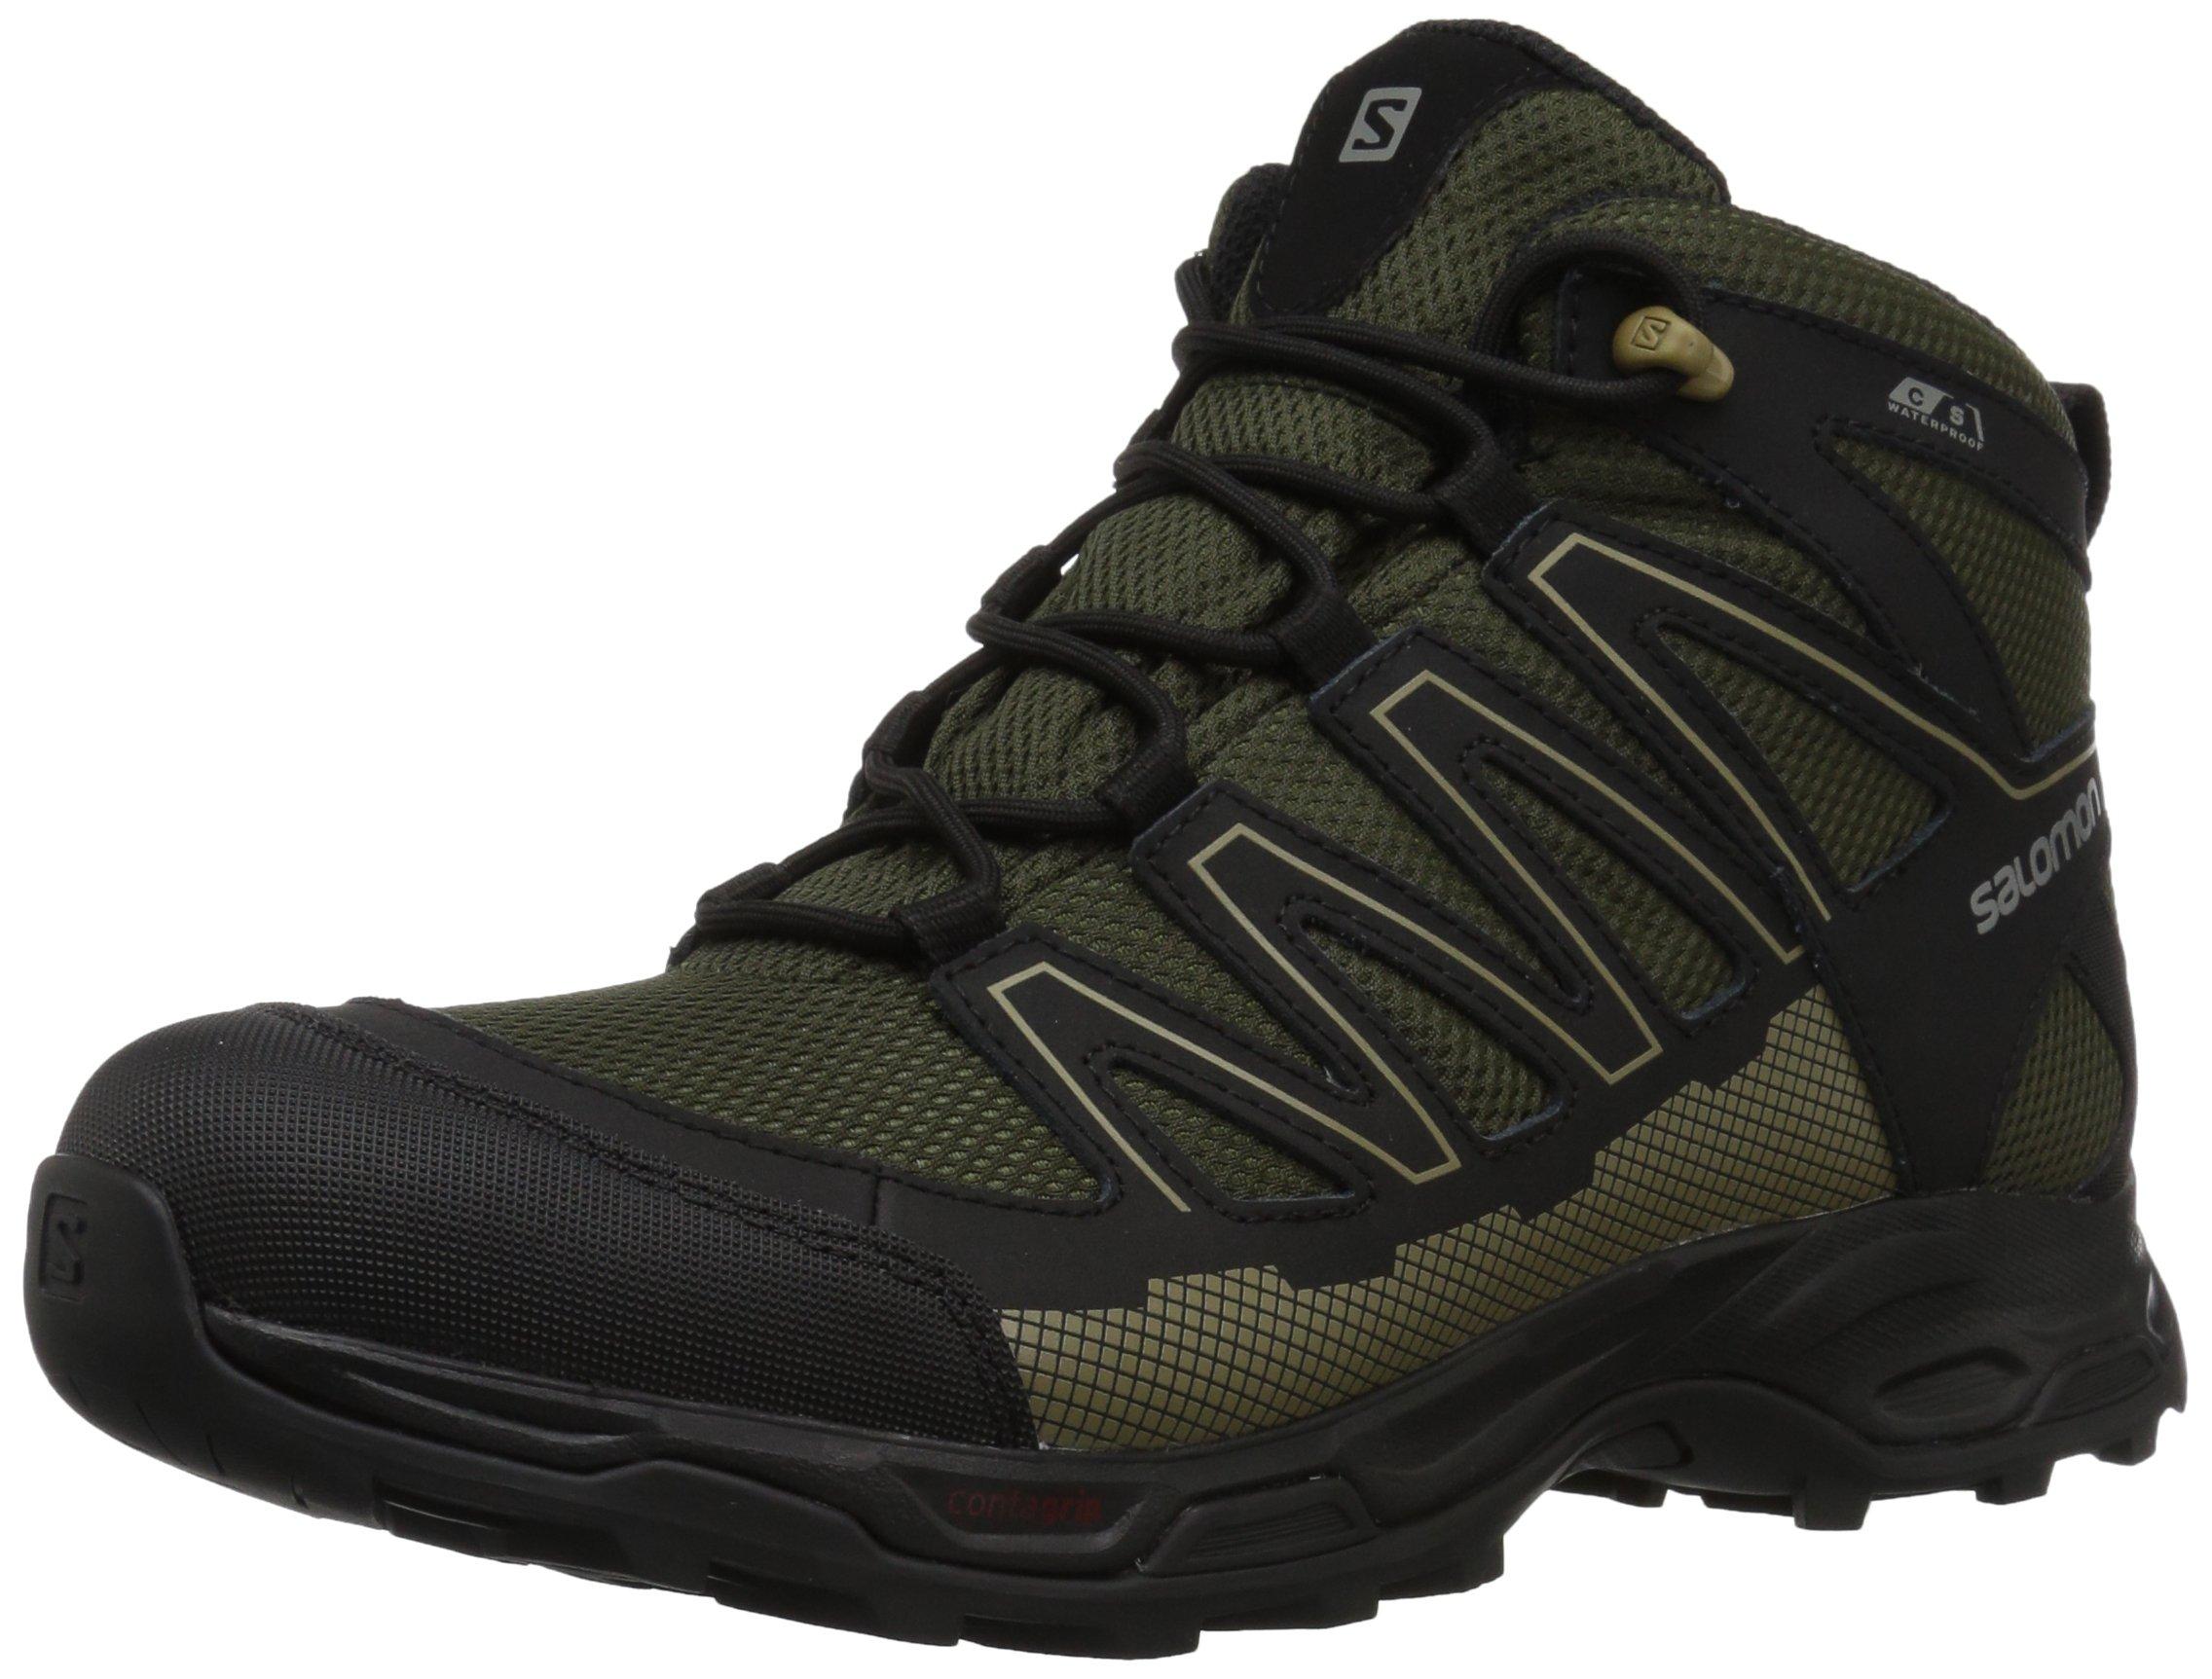 Salomon Men's Pathfinder Mid CSWP M Walking Shoe, Deep Depths/Black/Gothic Olive, 7 Medium US